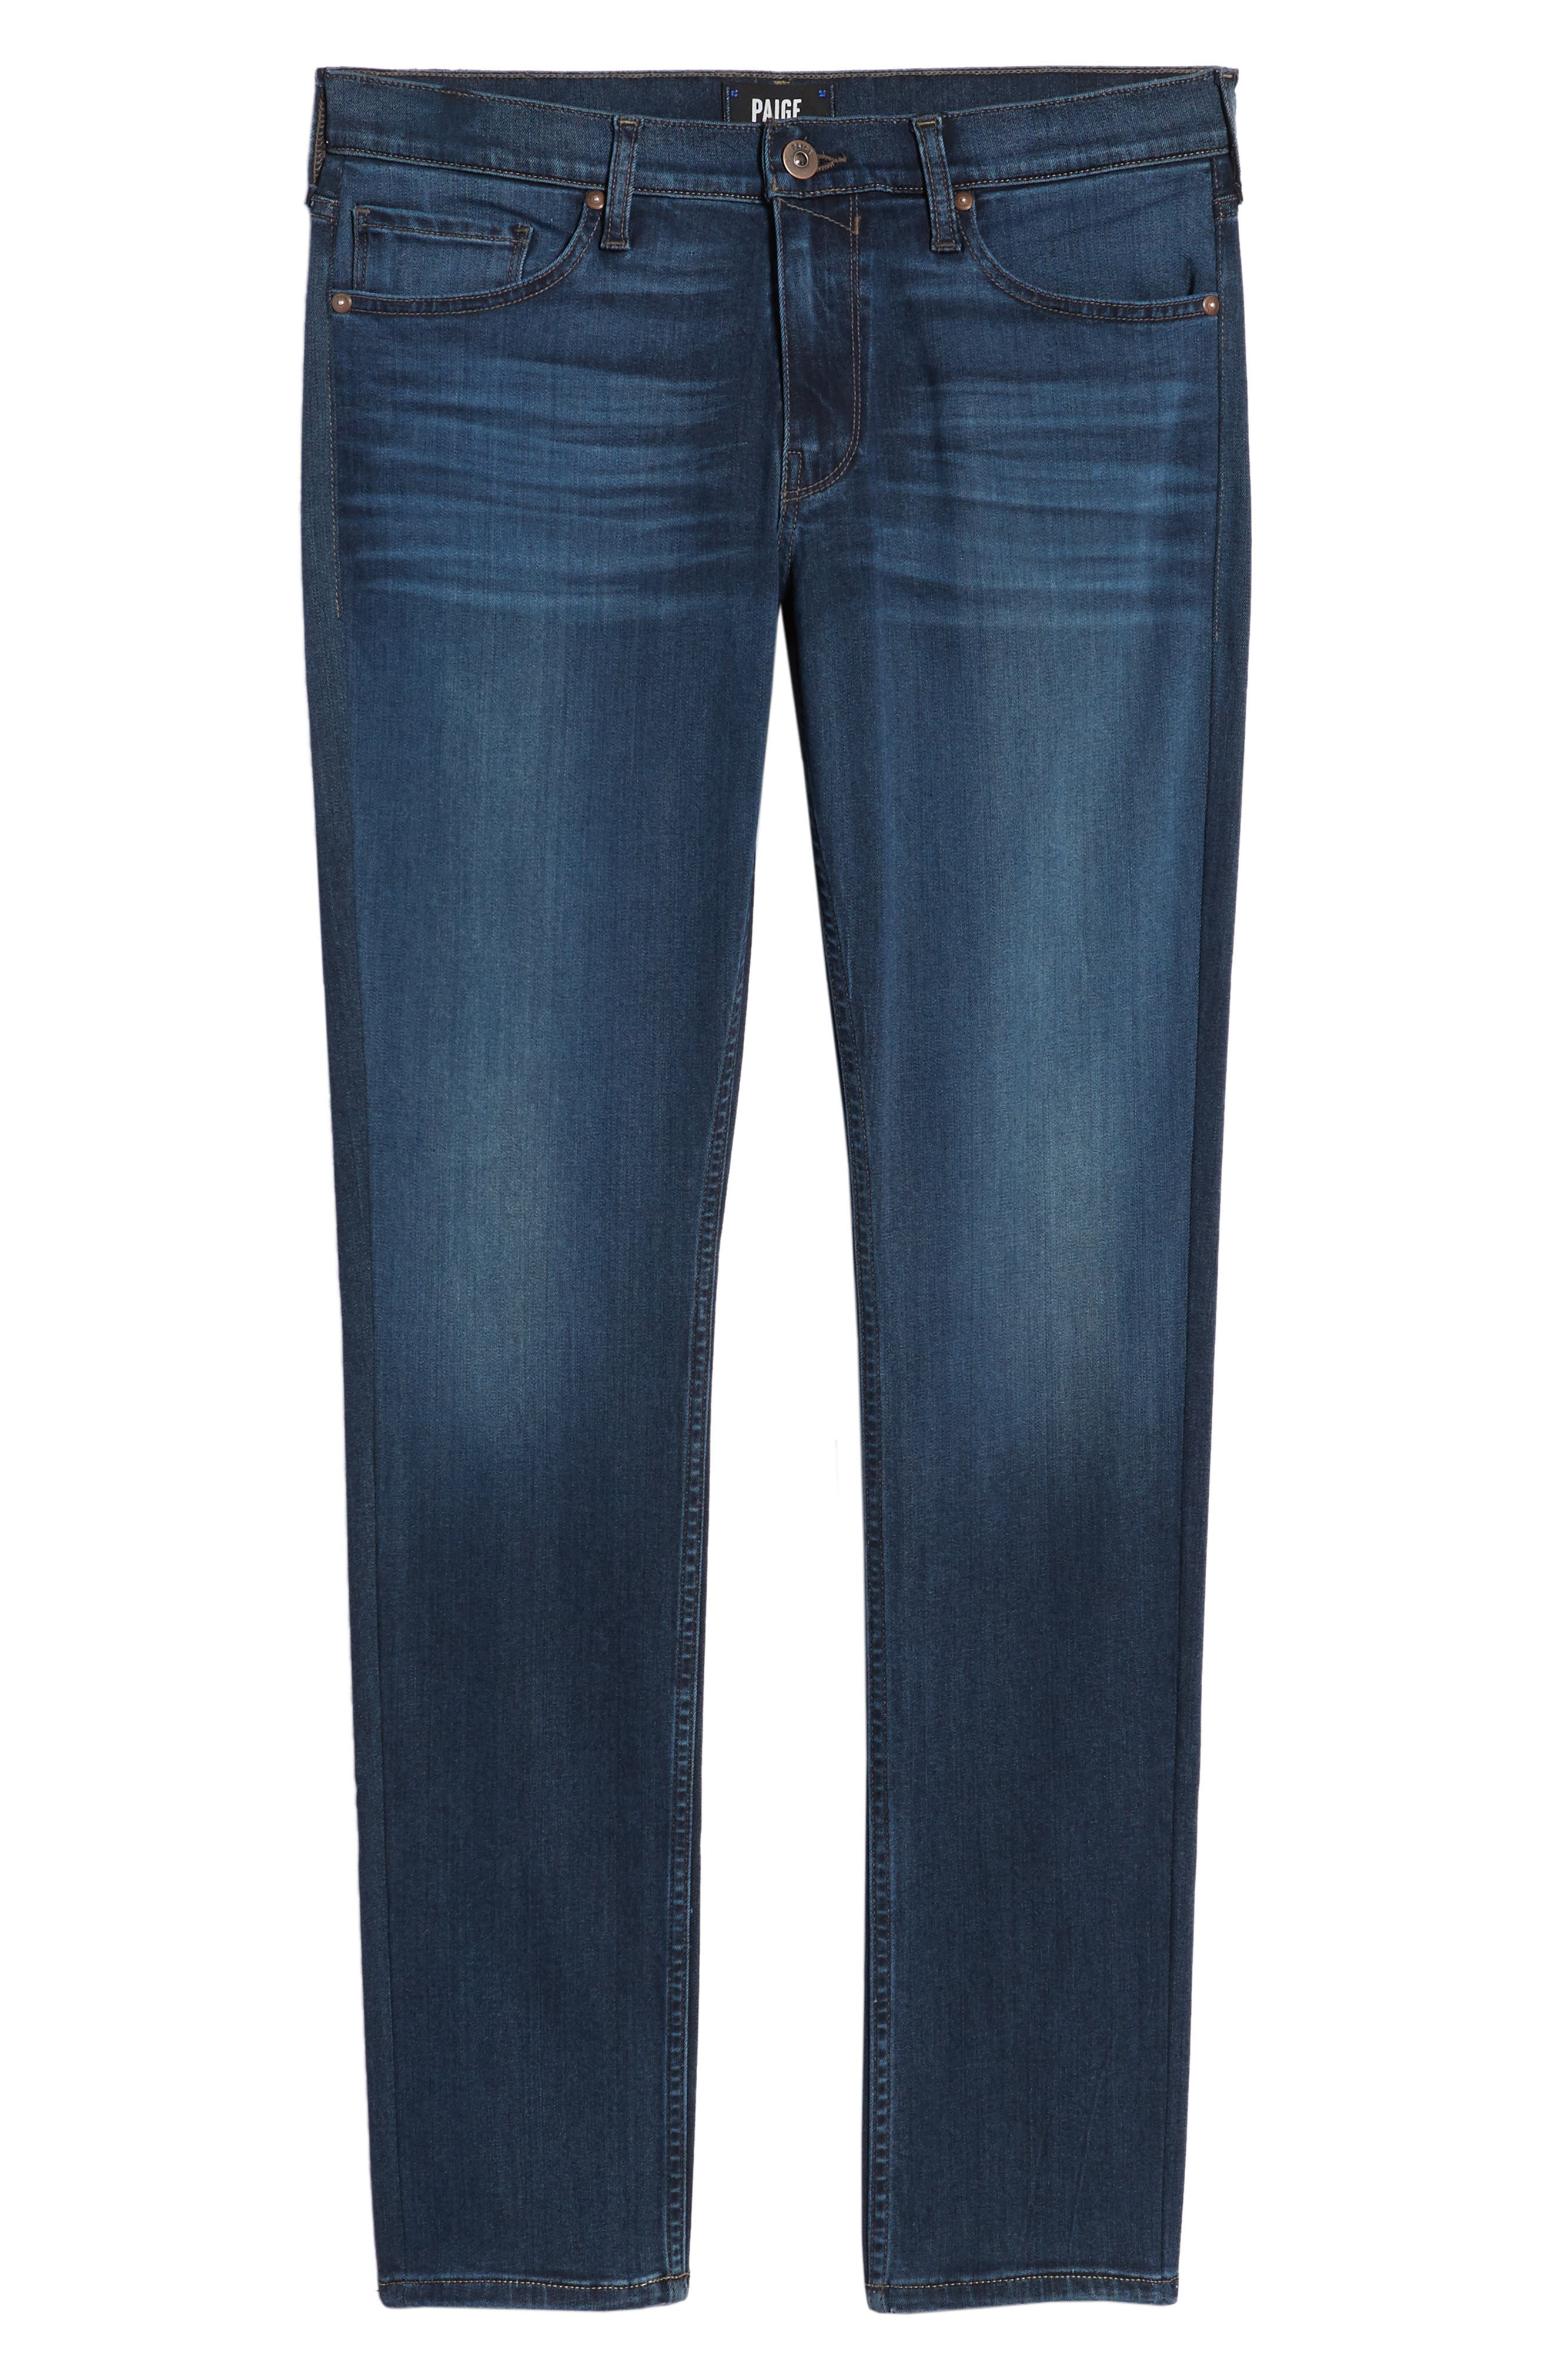 Transcend - Croft Skinny Fit Jeans,                             Alternate thumbnail 6, color,                             HUXLEY